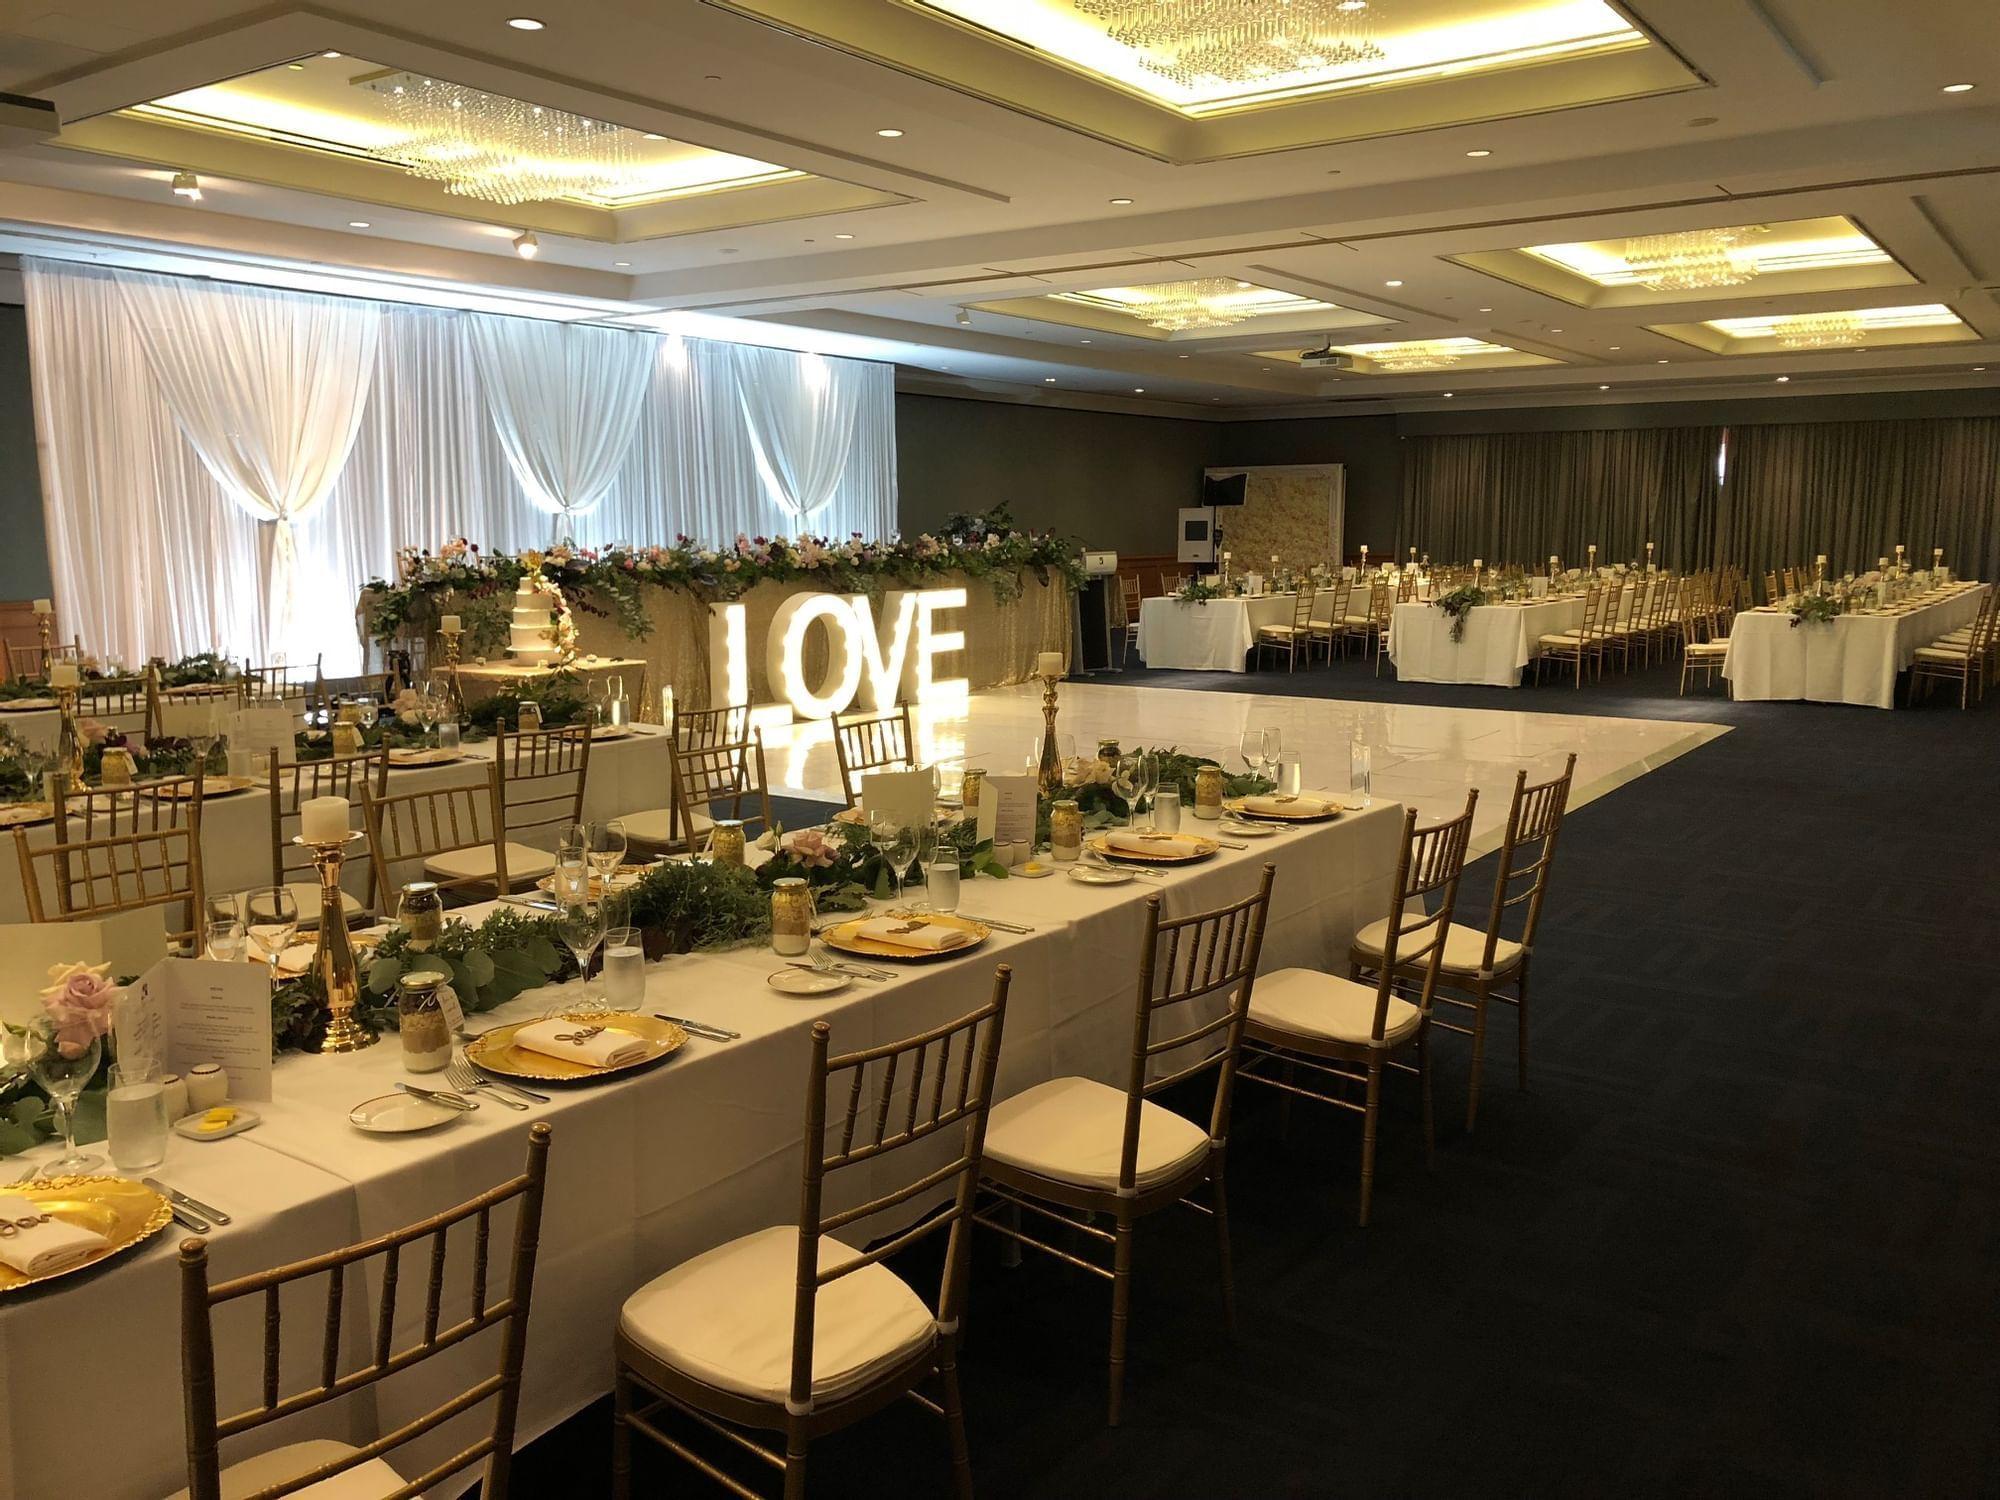 Ballroom wedding reception with love sign at Duxton Hotel Perth